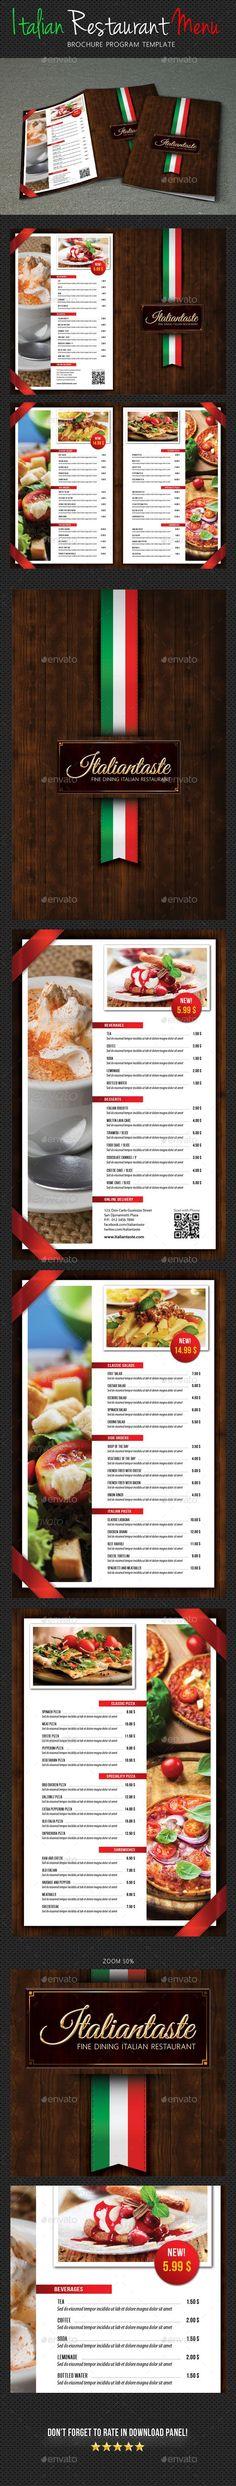 Food Menu Flyer Template Psd  Best Food Menu Templates